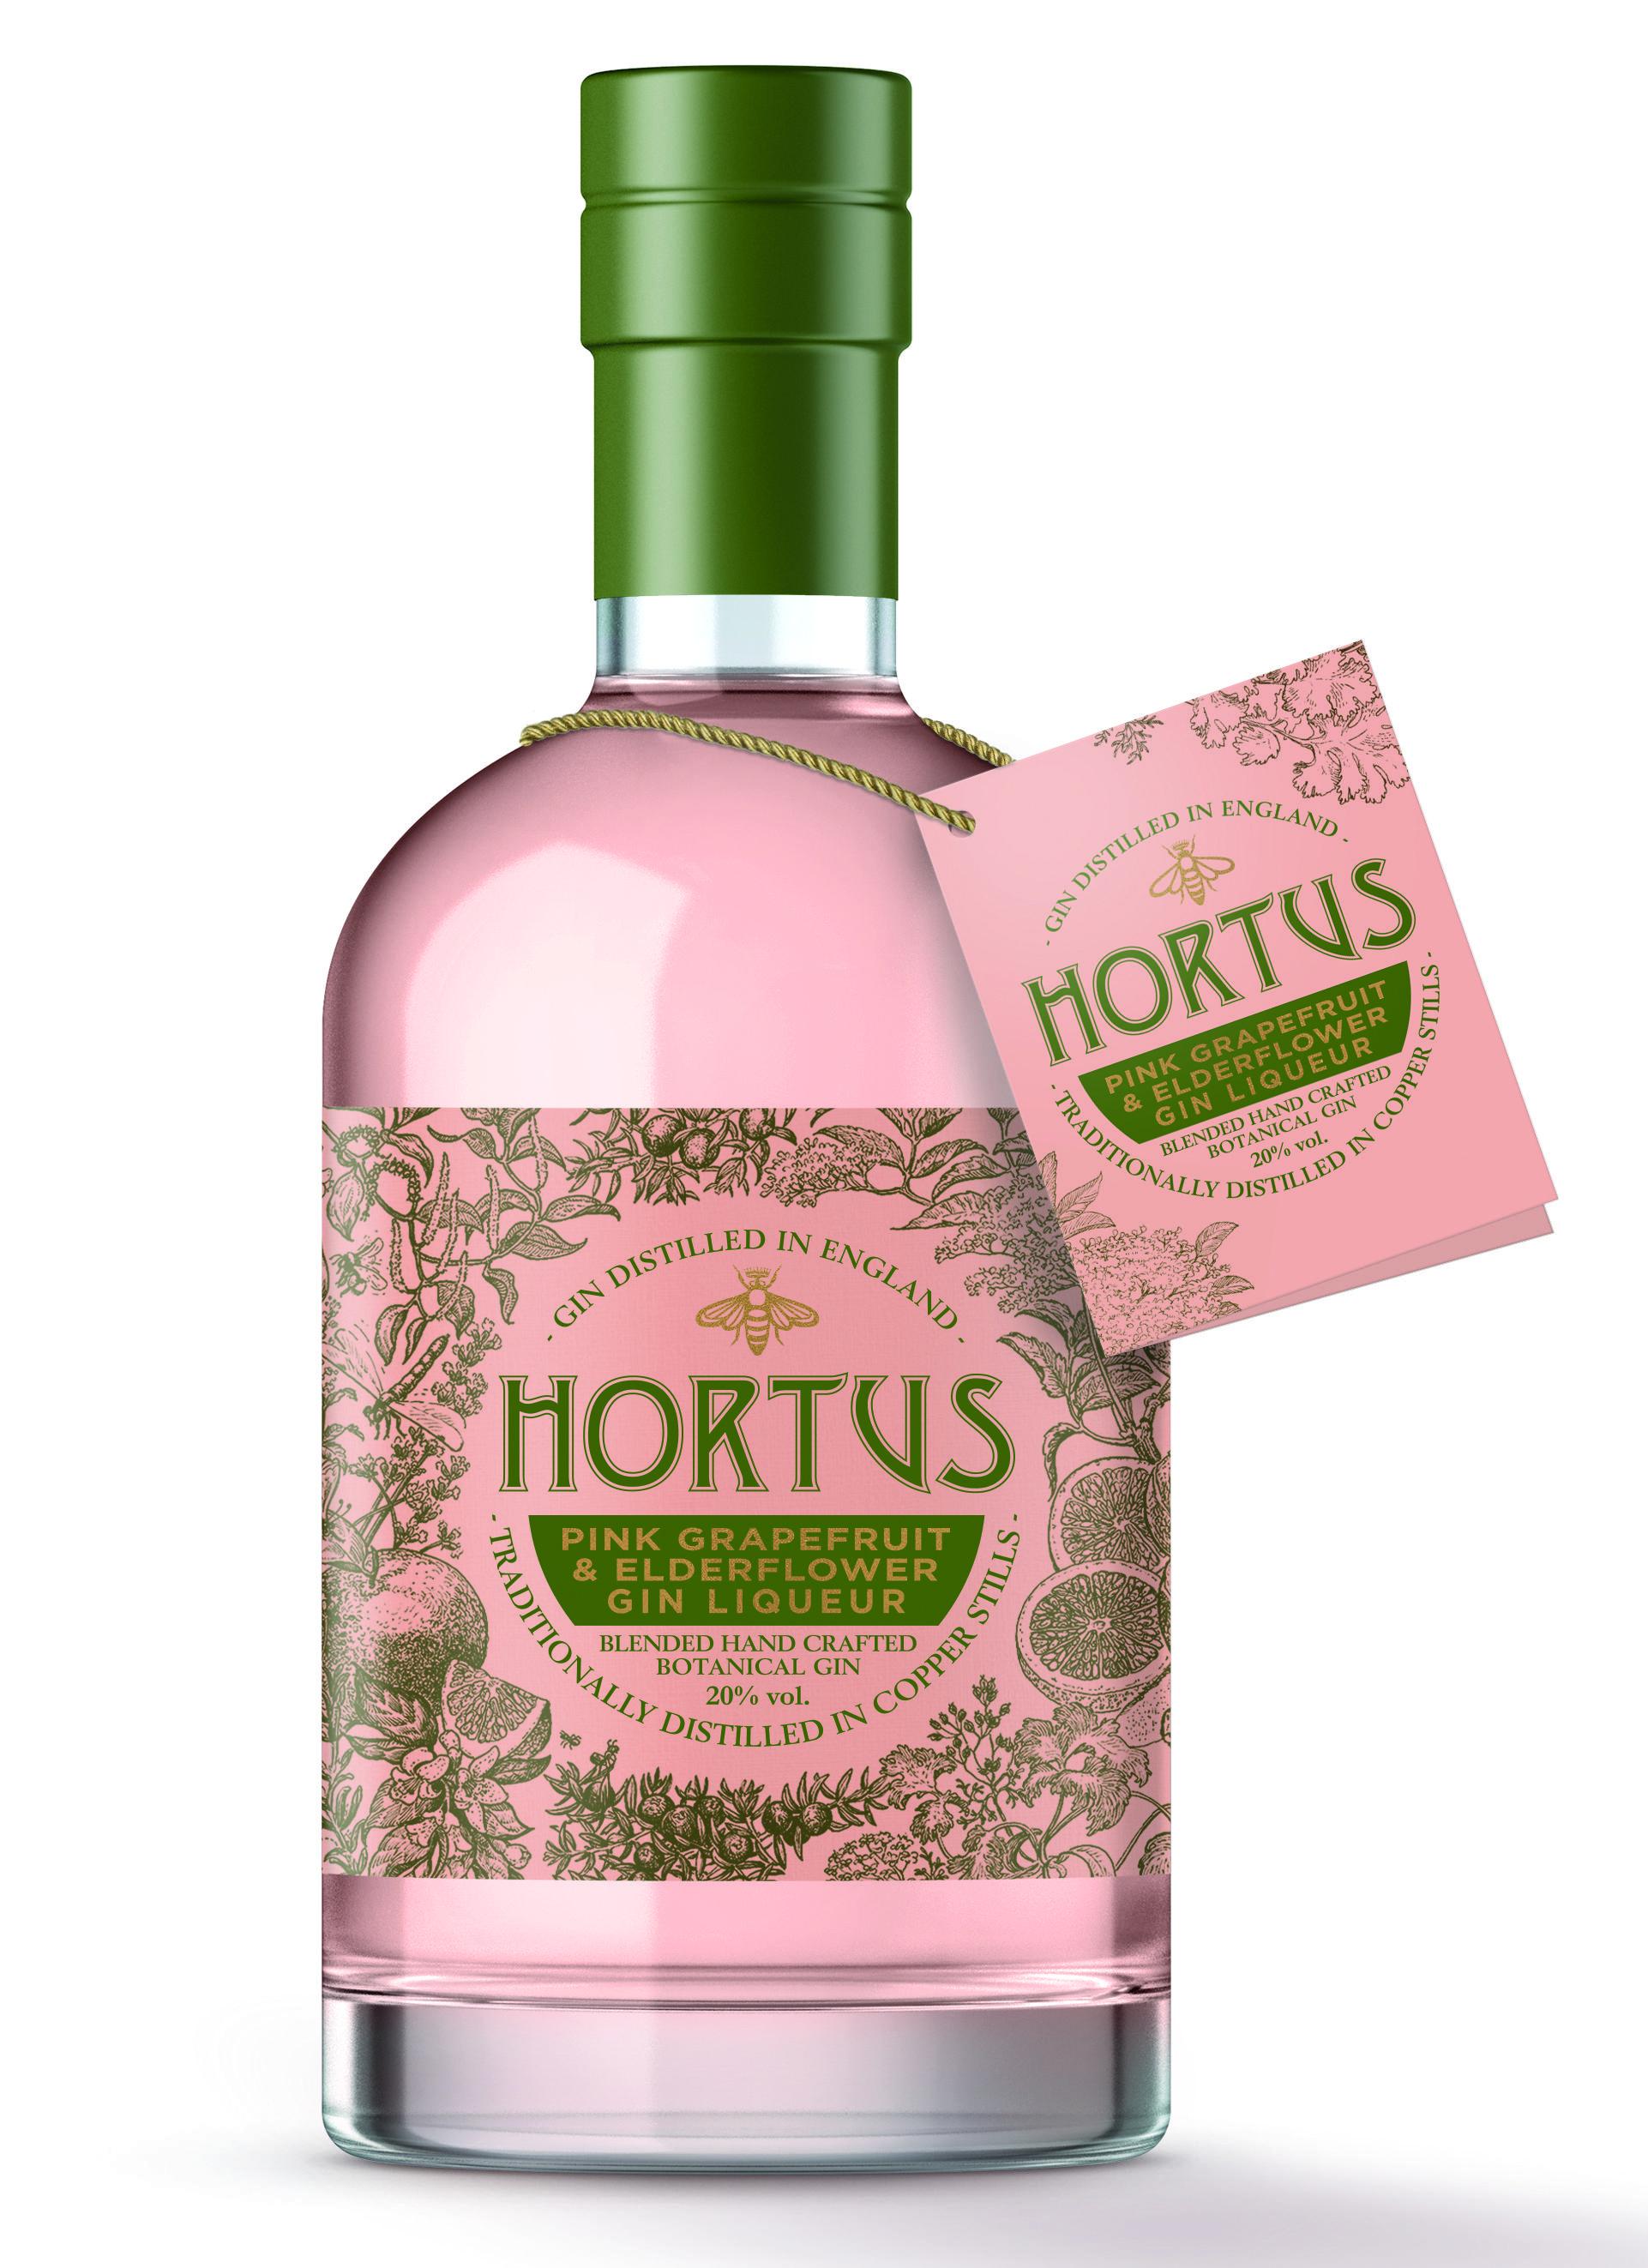 Image result for hortus pink grapefruit